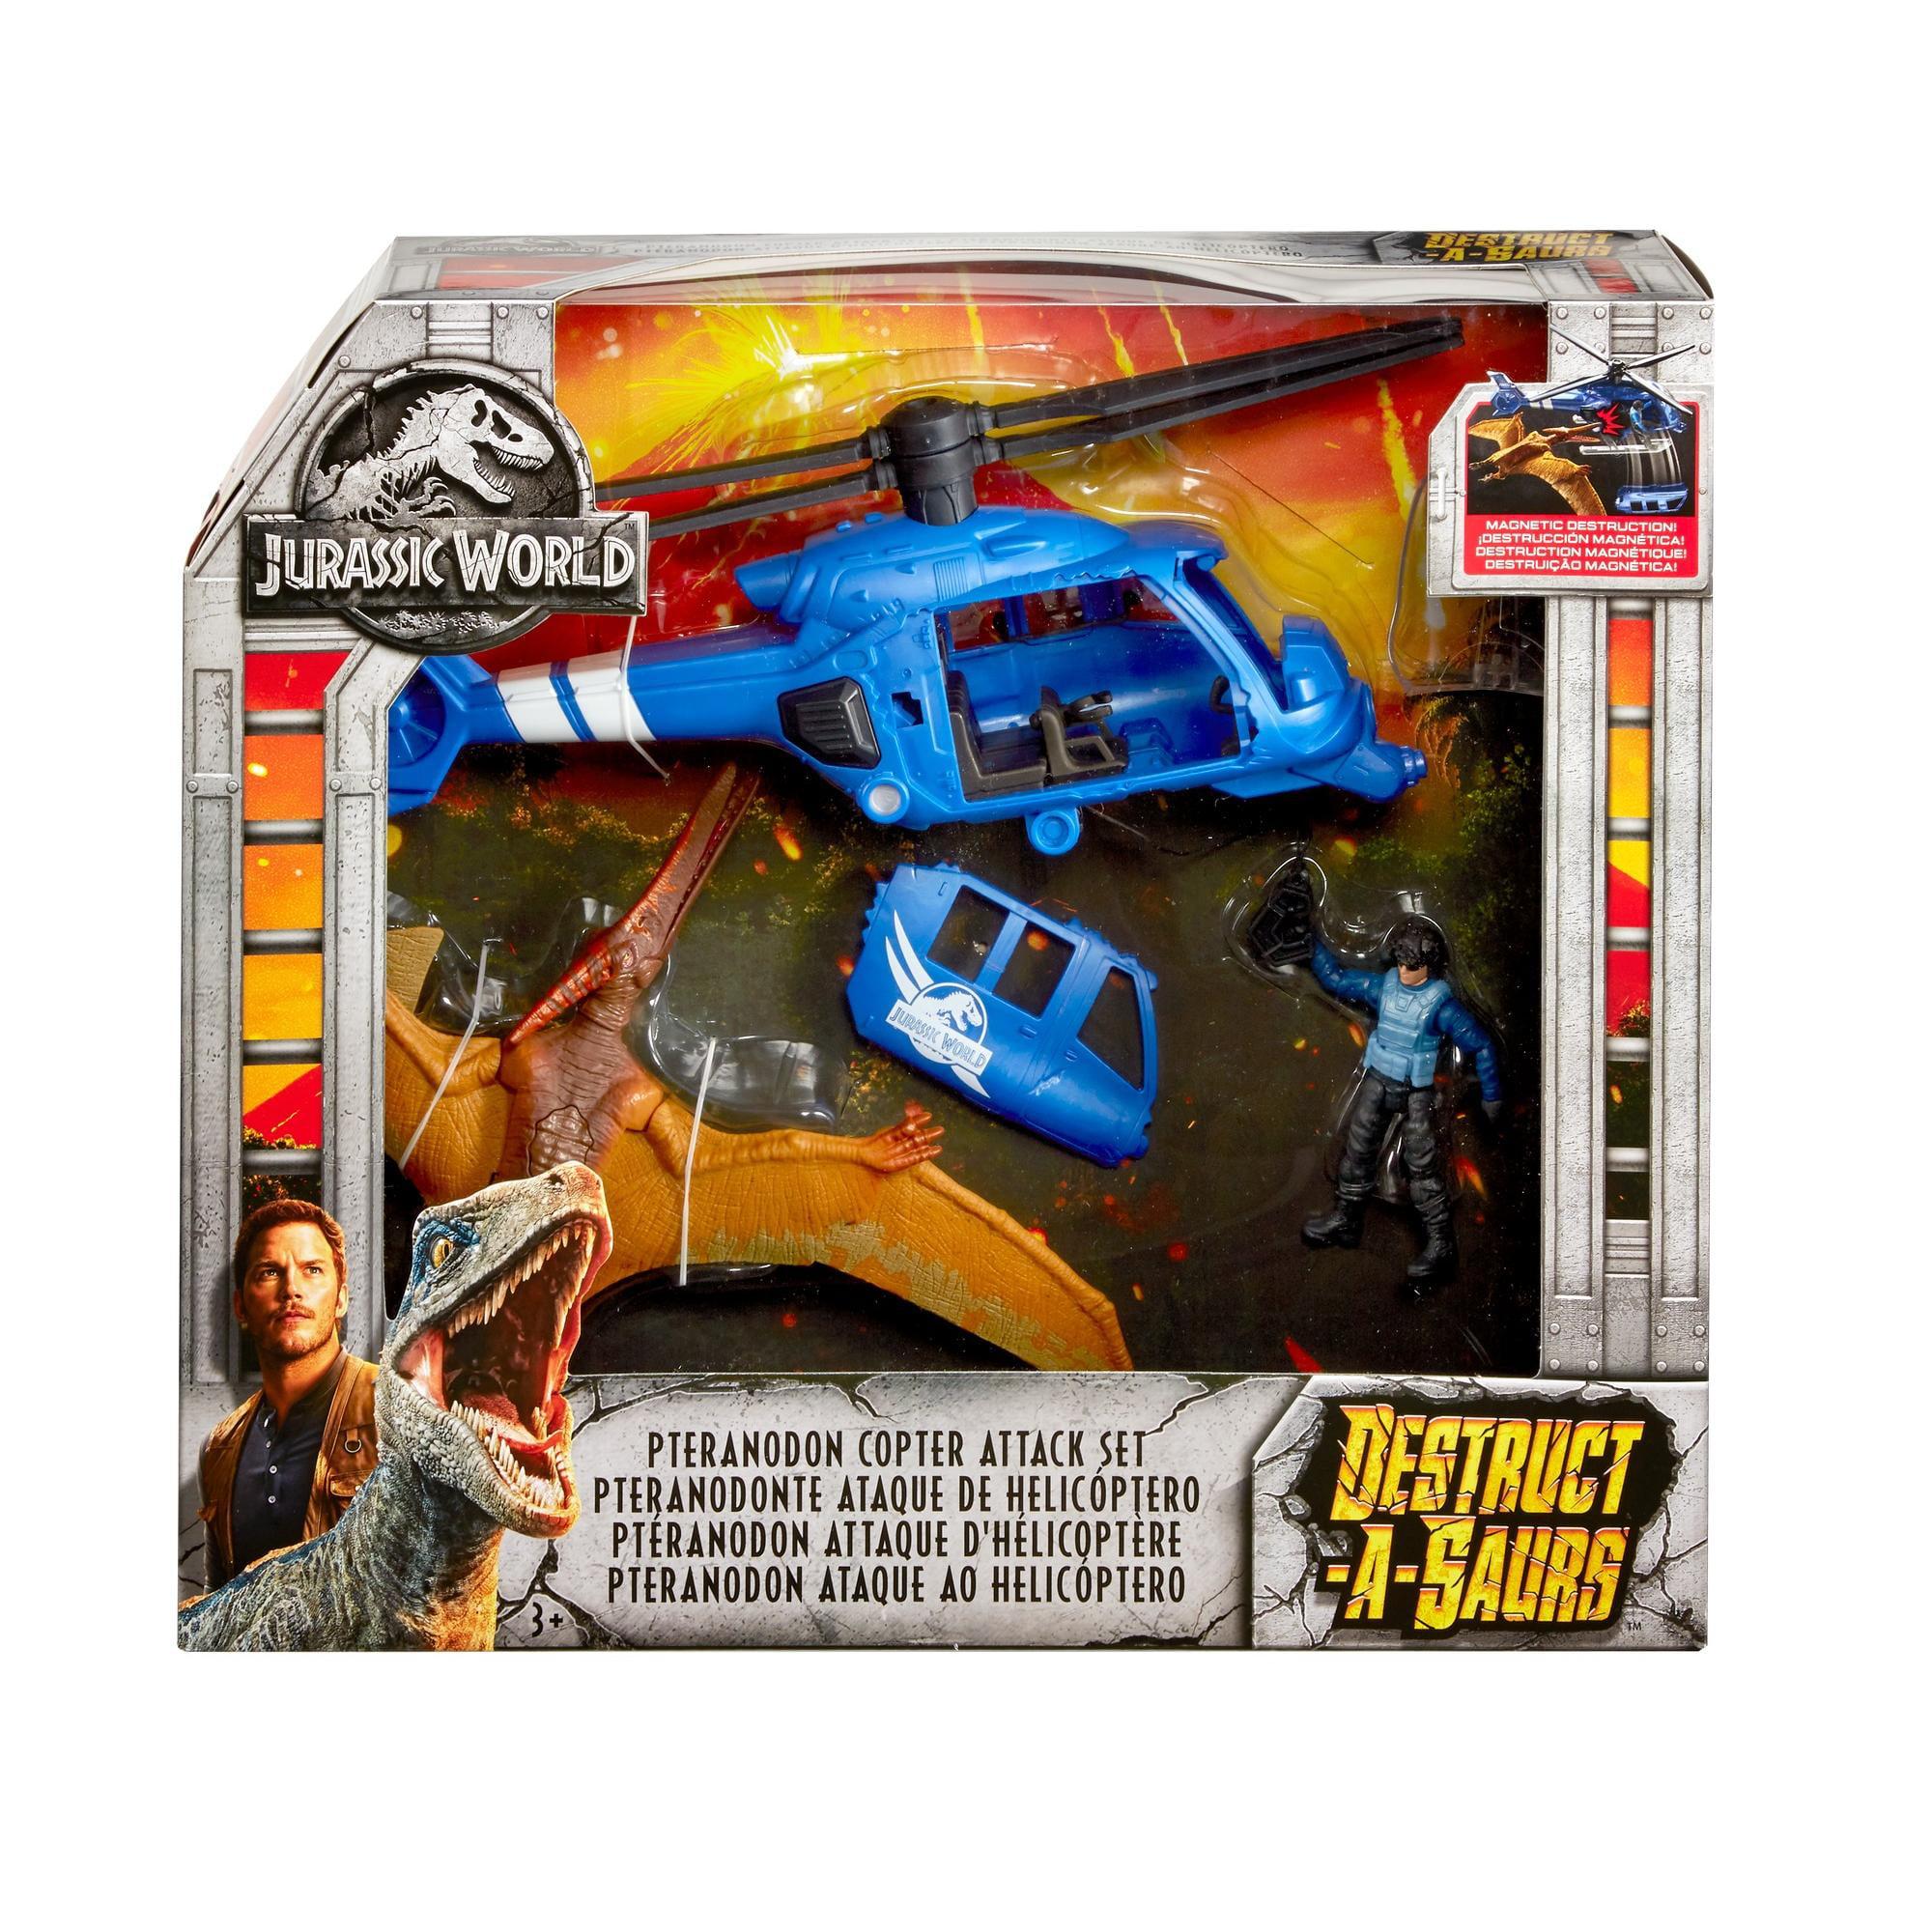 Jurassic World Destruct-A-Saurs Velociraptor /& Pteranodon SET Jurassic Park NEW